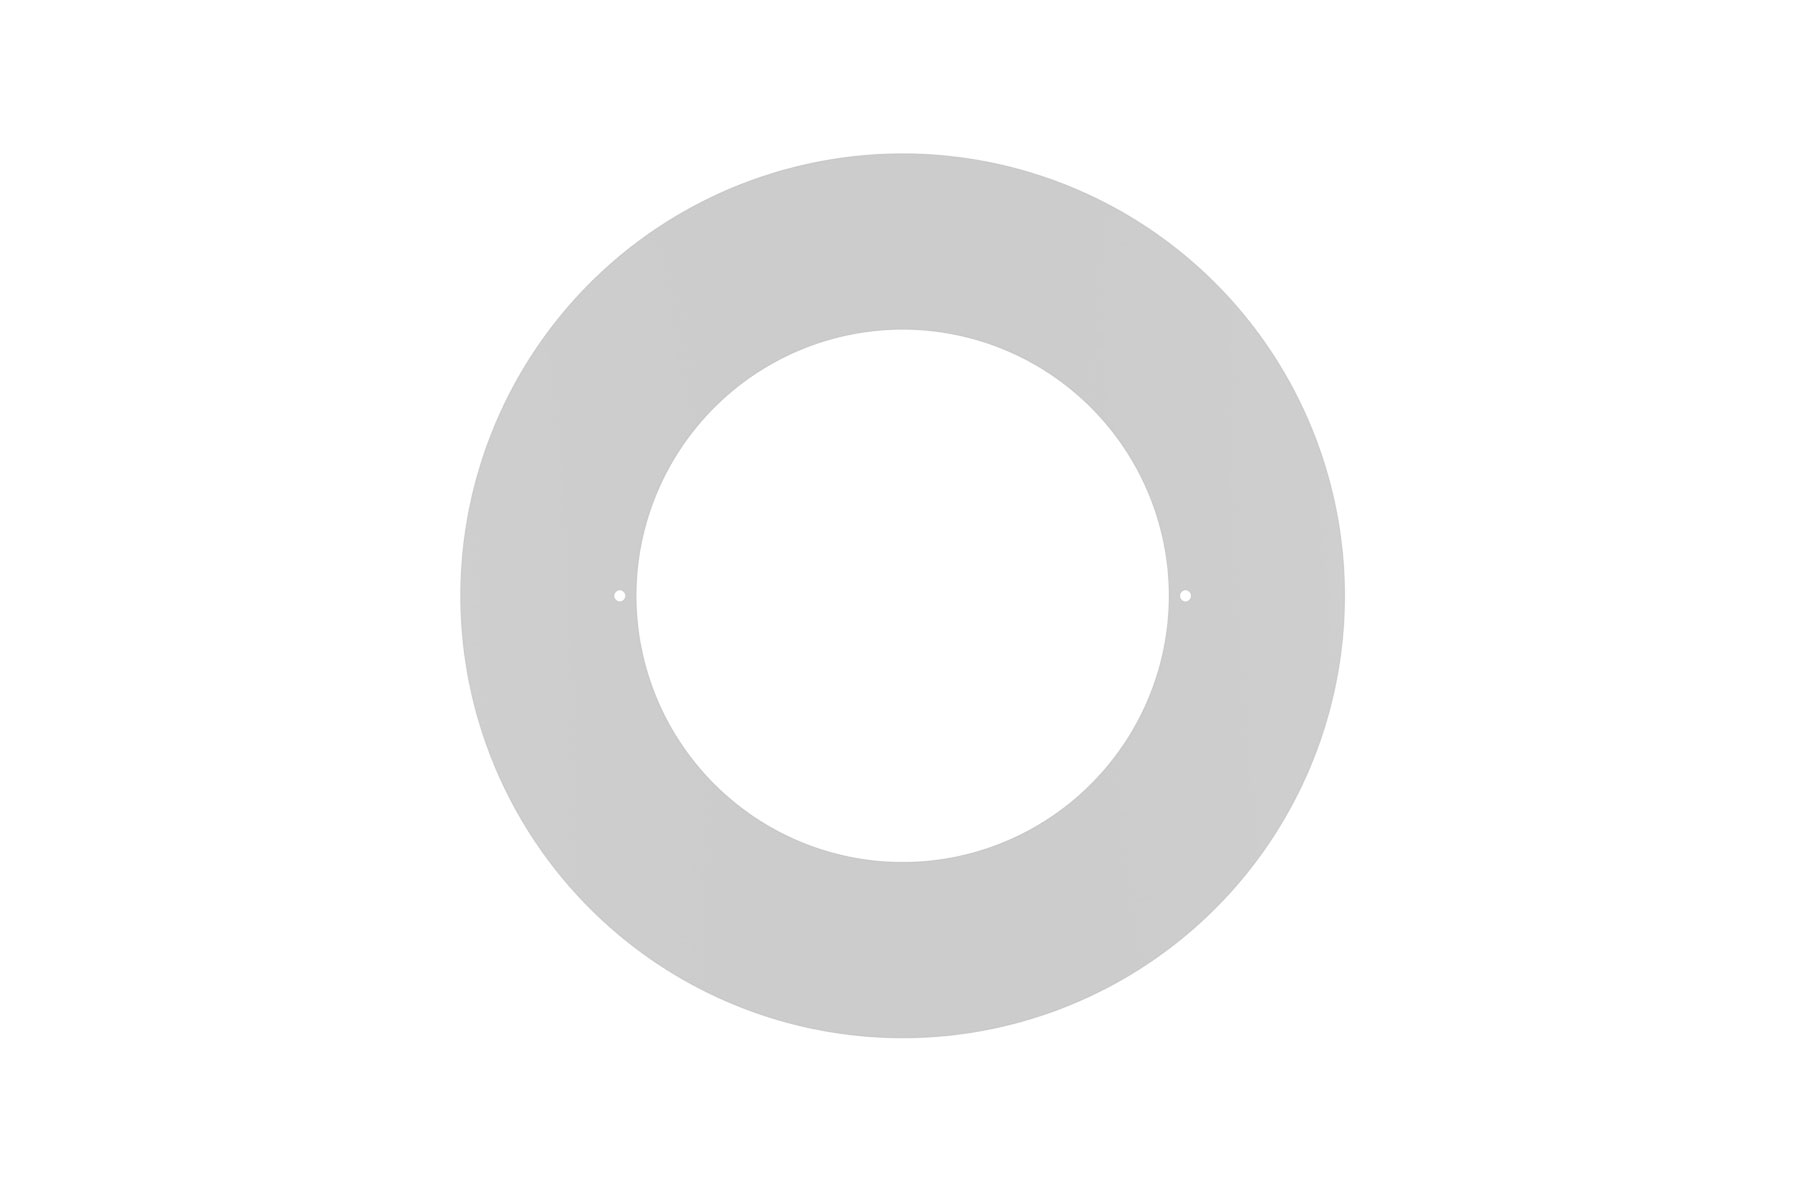 "Goof Ring Overall Diameter 12 1/2"" for DLCLR 8 Inch LED Commercial Recessed Light"